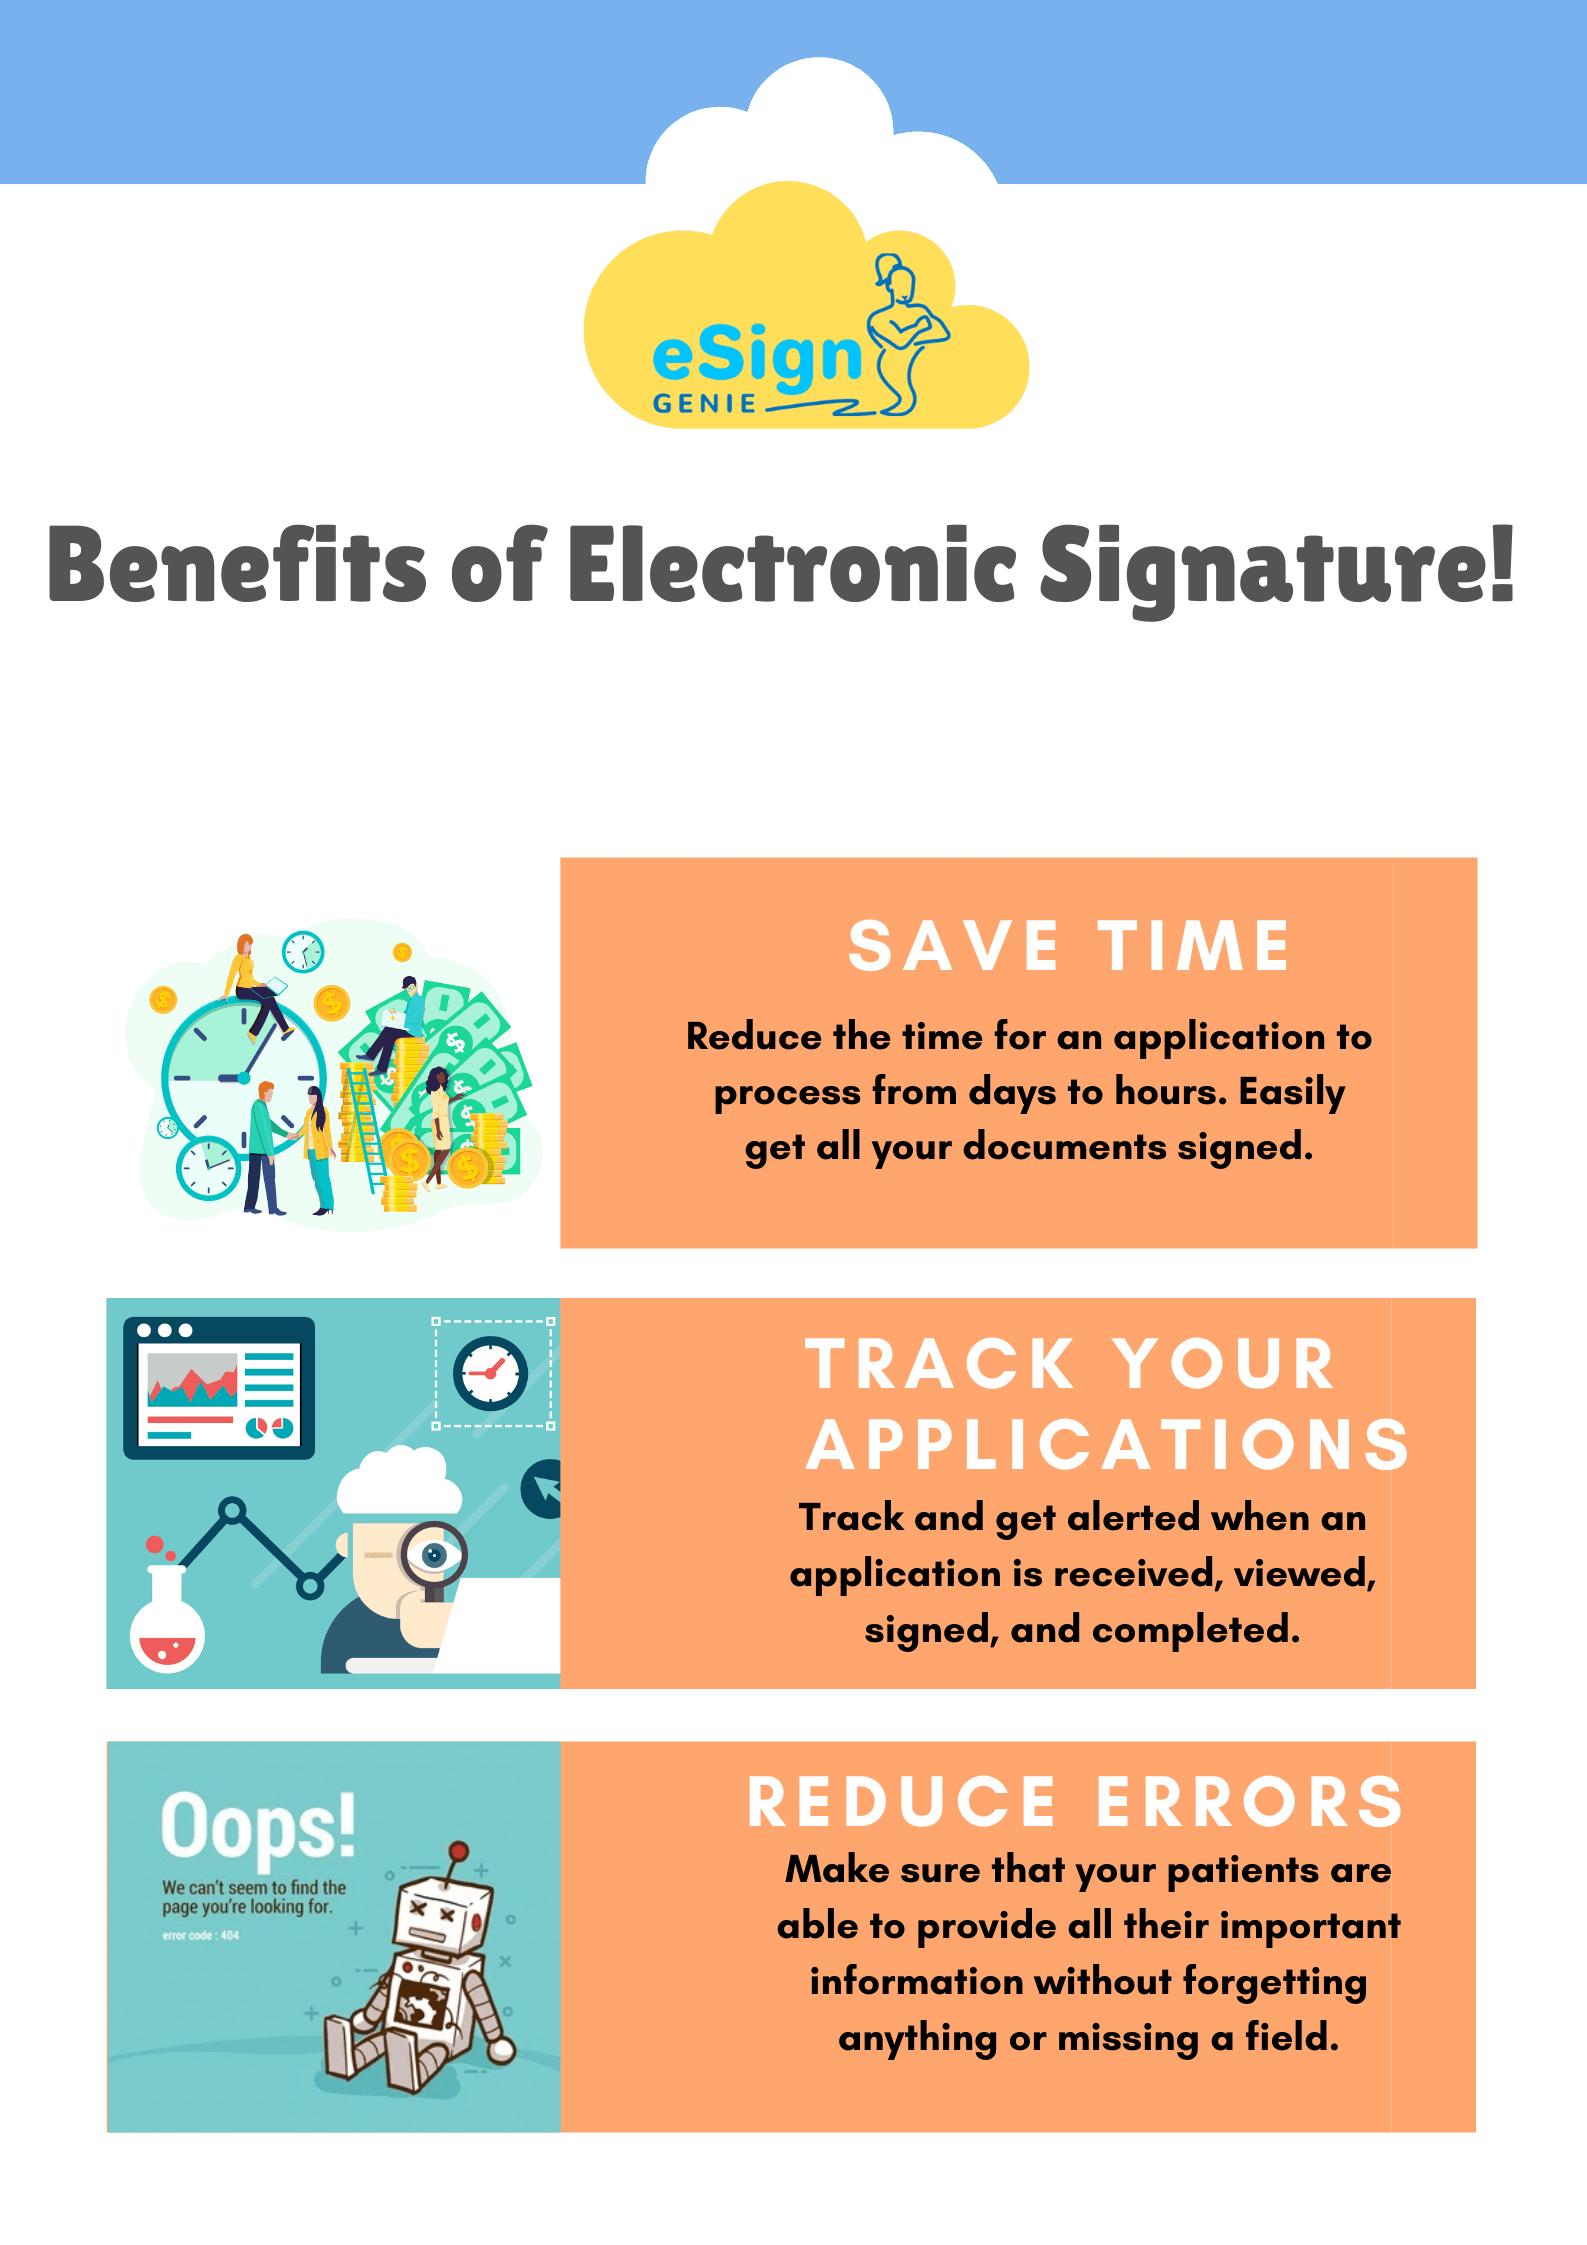 Benefits-of-Electronic-Signature